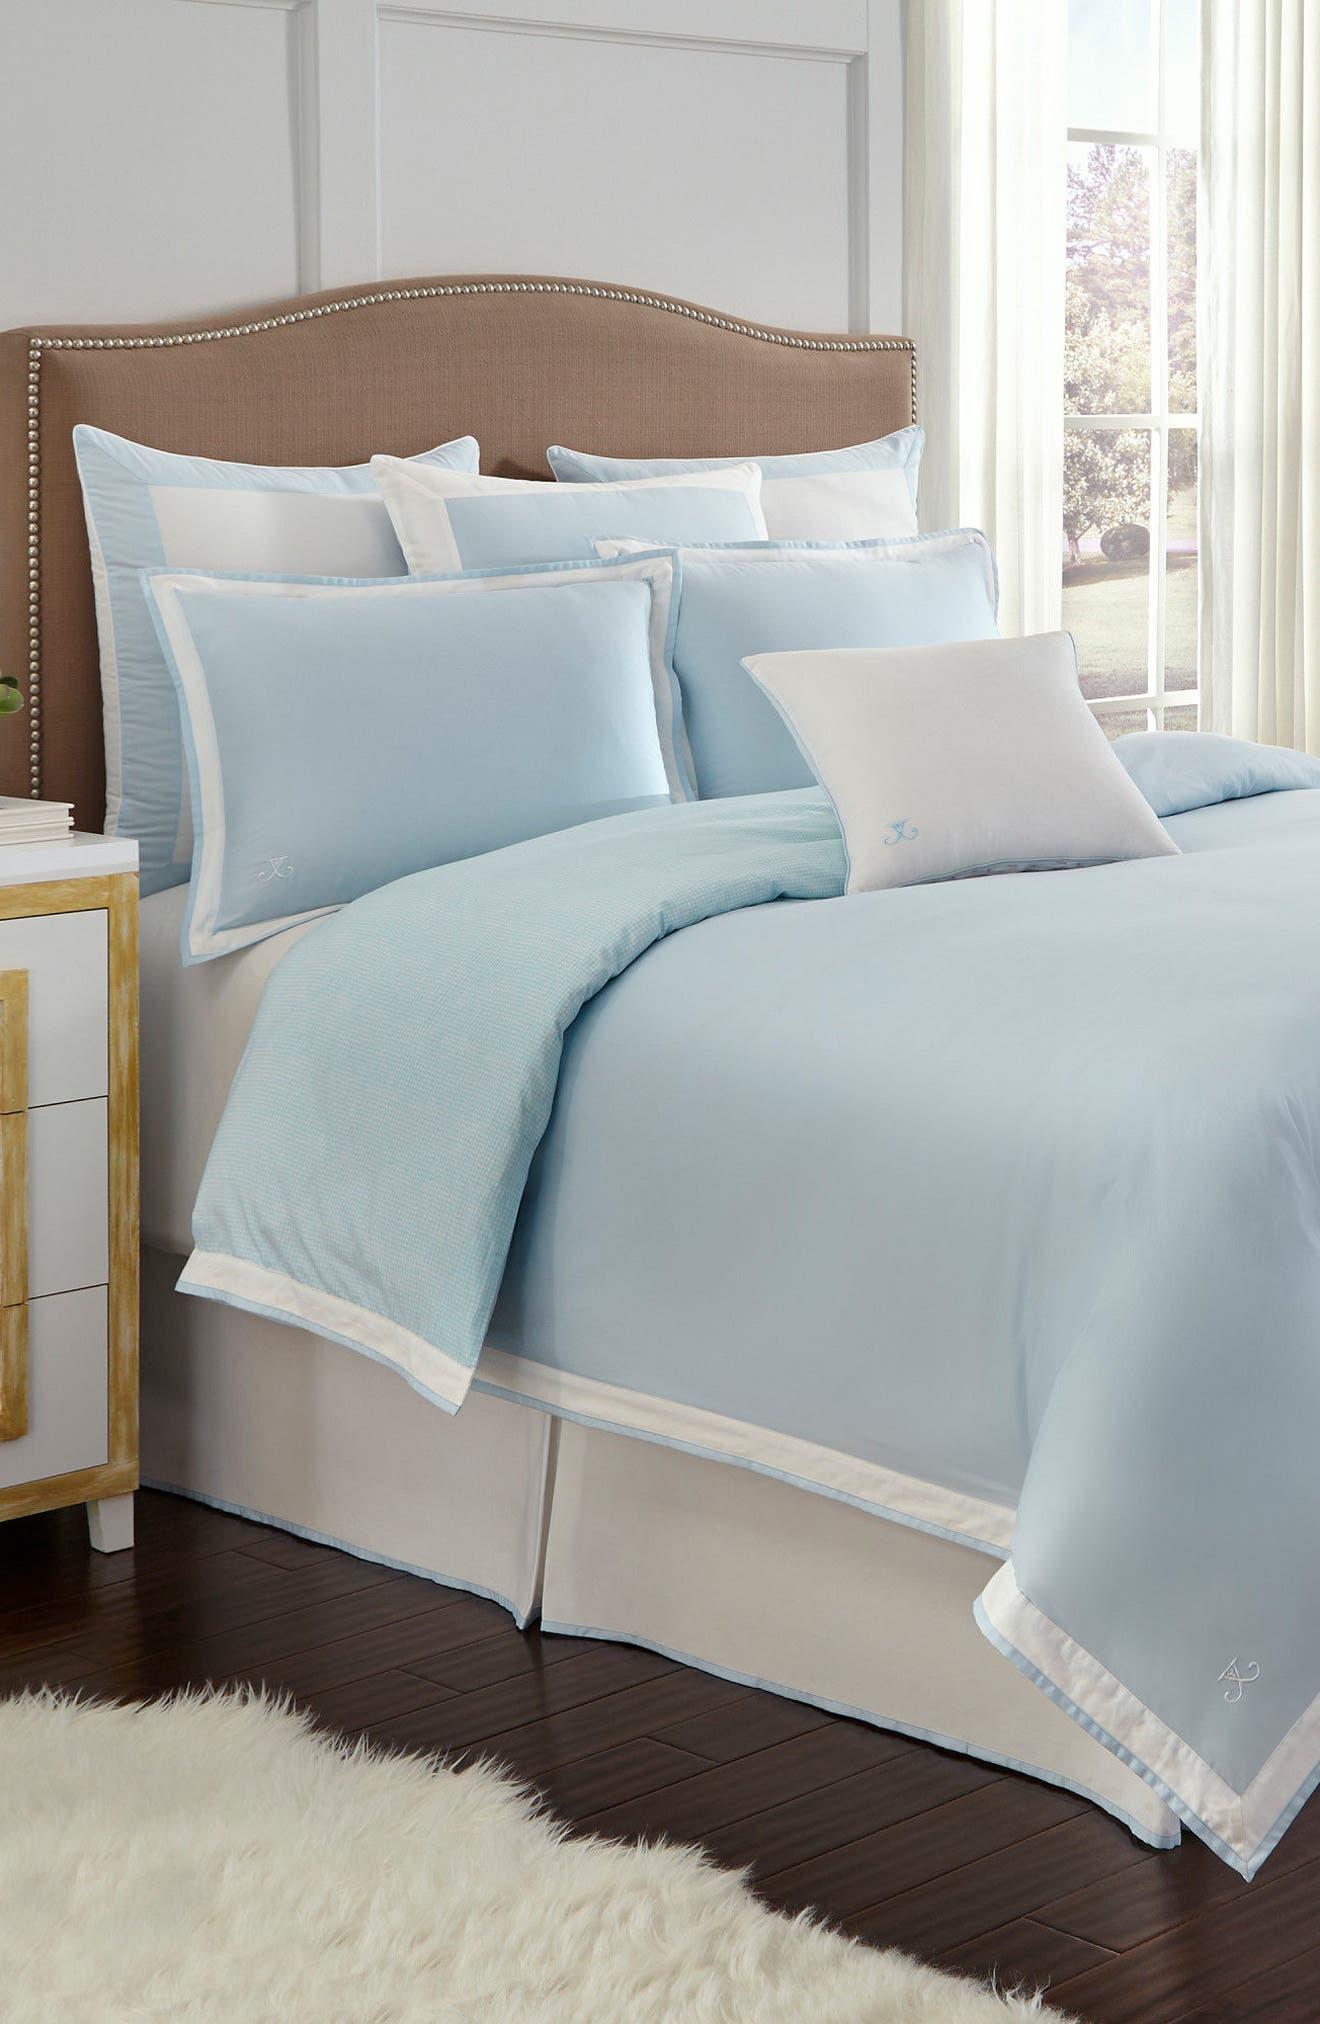 Jill Rosenwald Sugarhouse Comforter